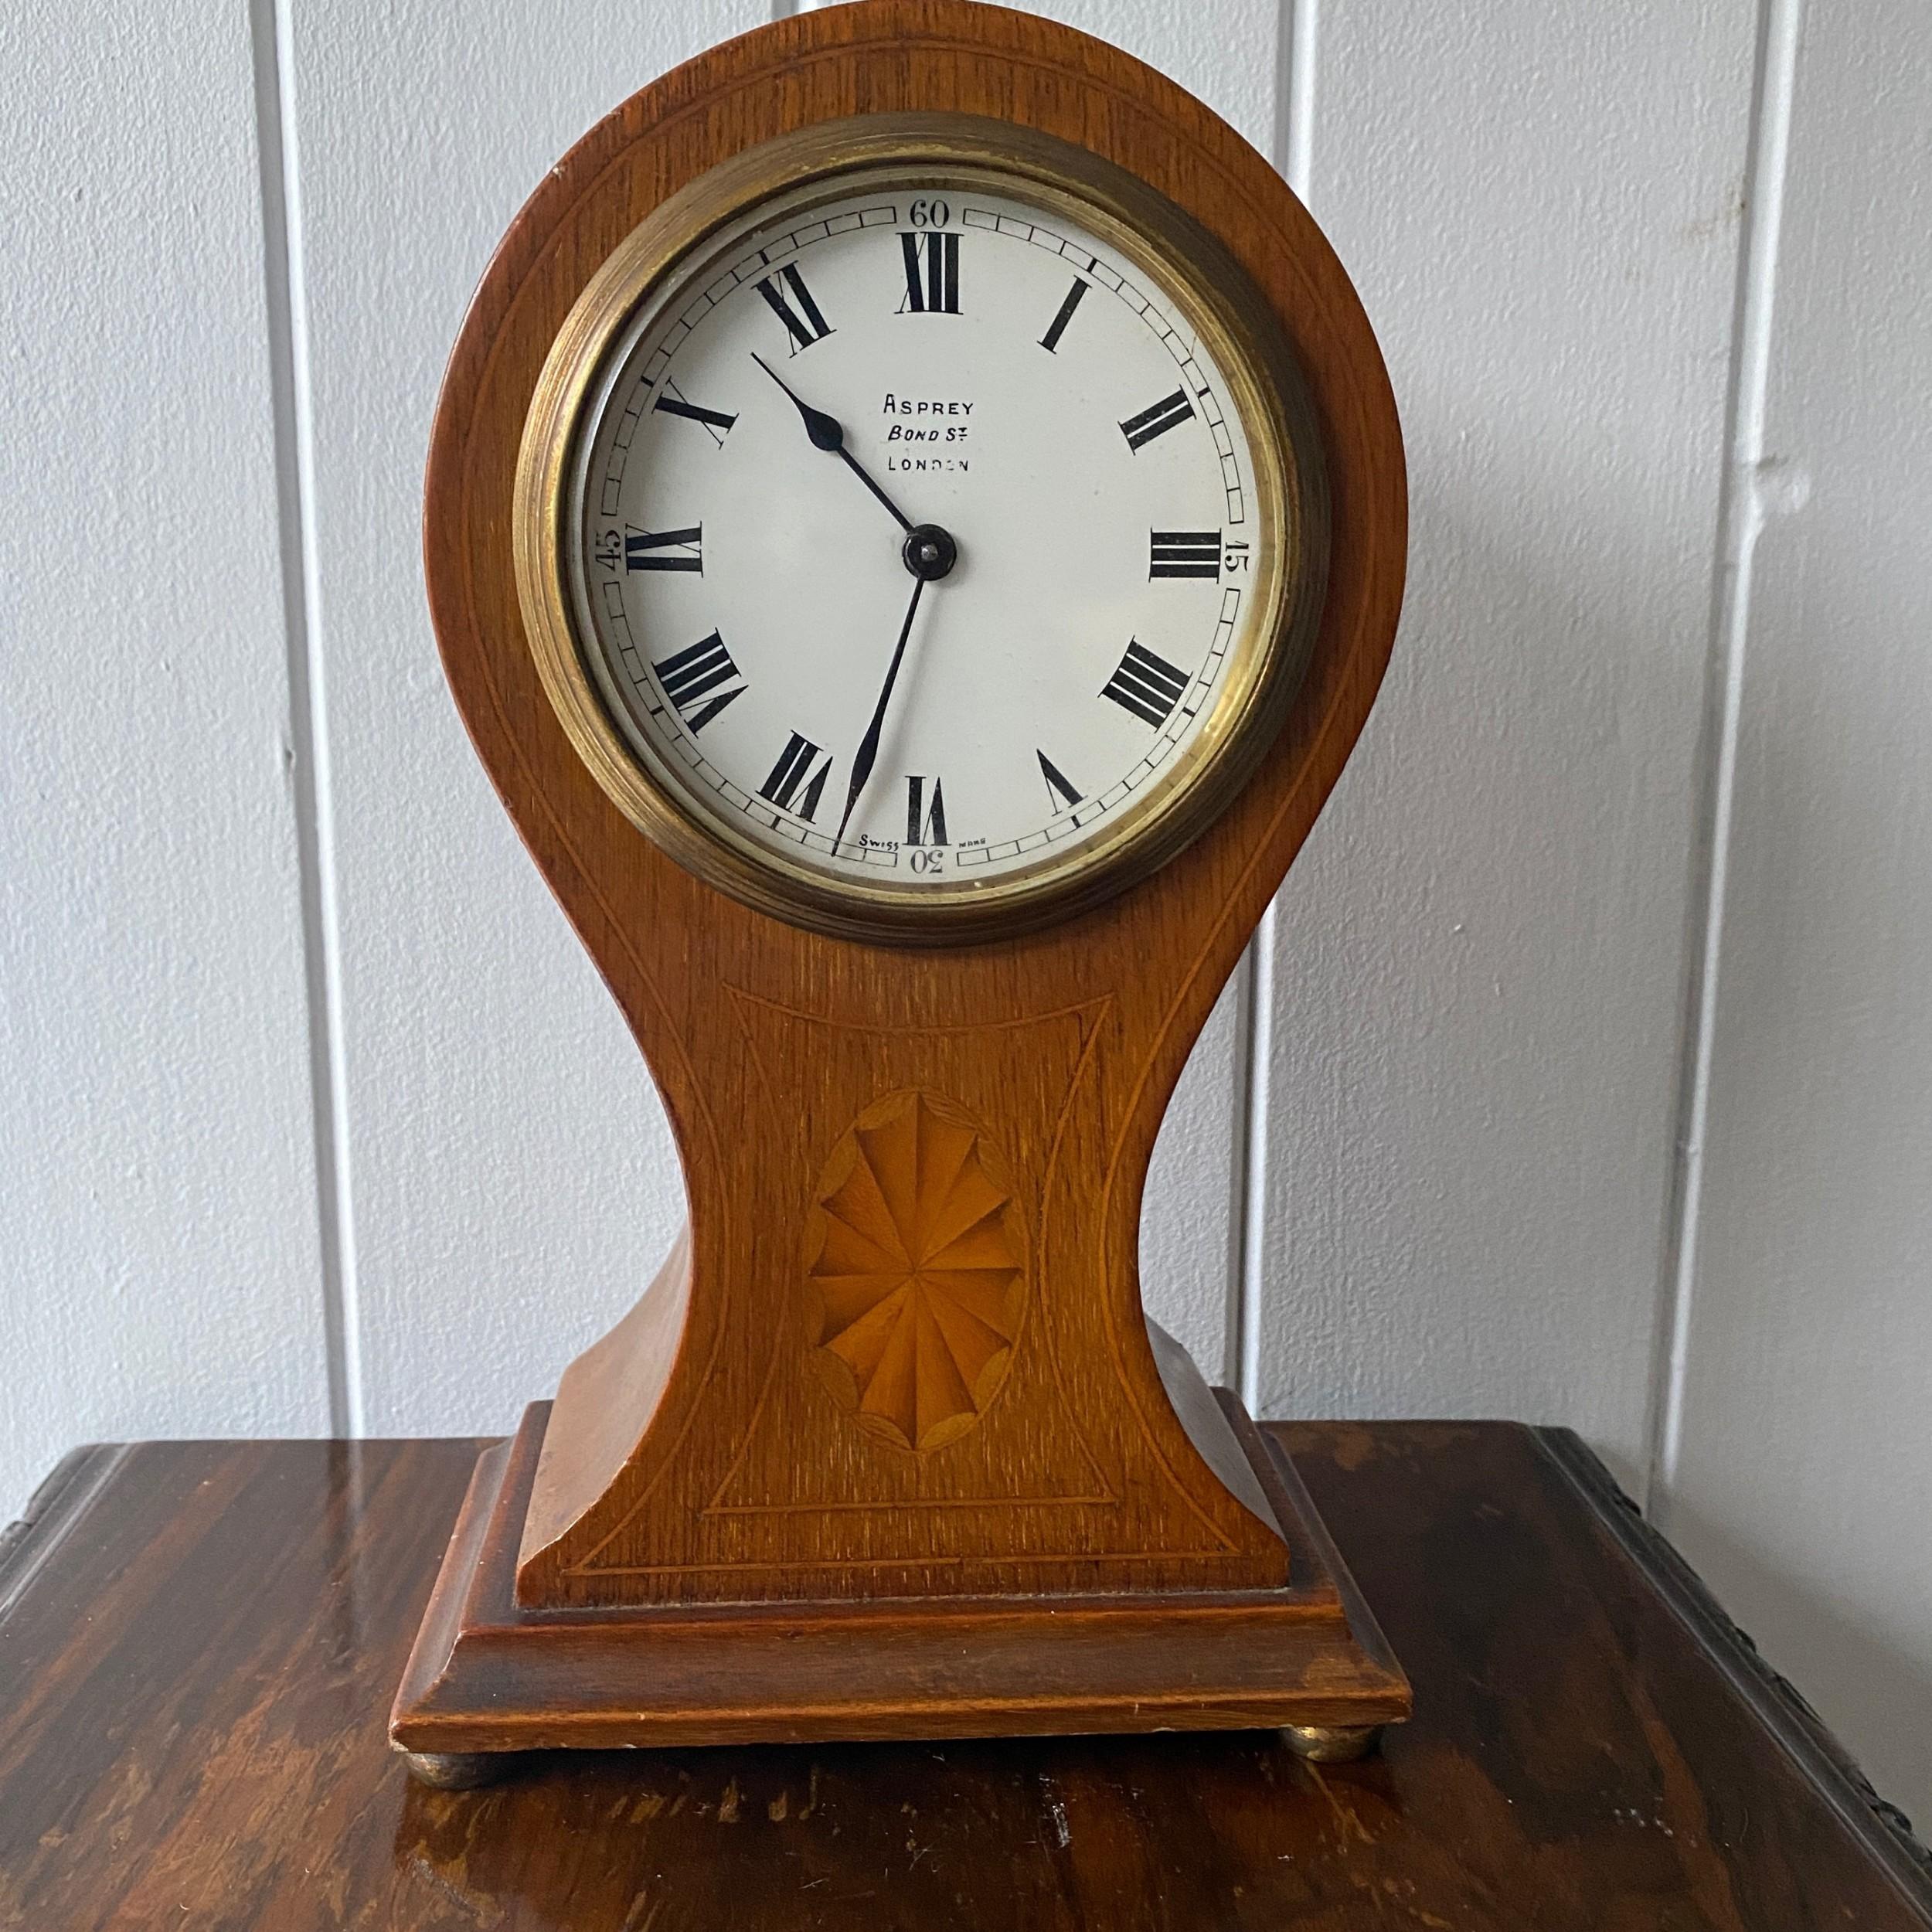 an edwardian inlaid mahogany balloonshape mantel clock by asprey london